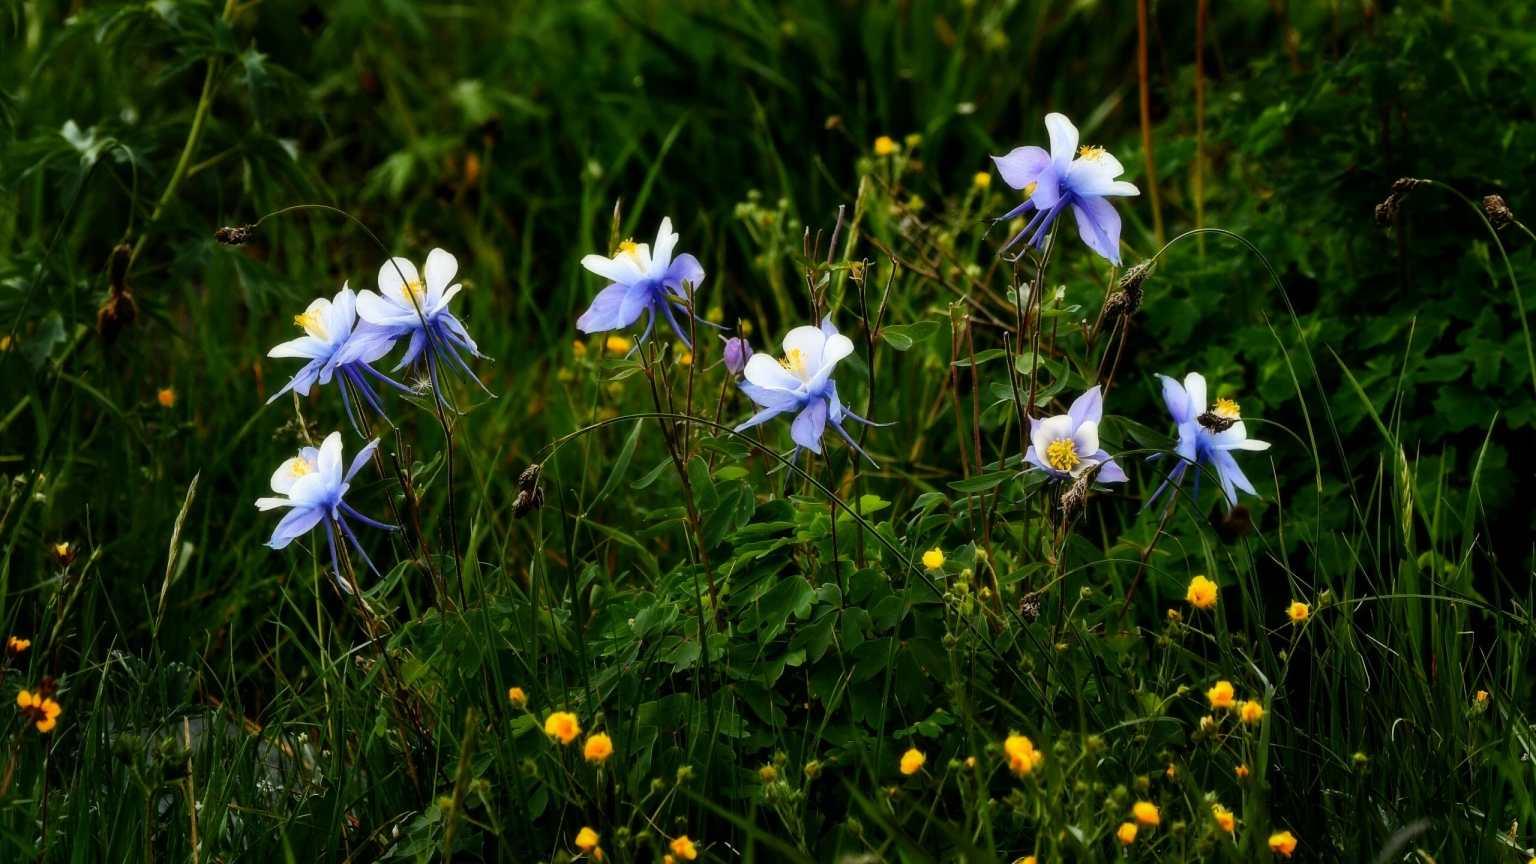 colorado columbine flowers outside